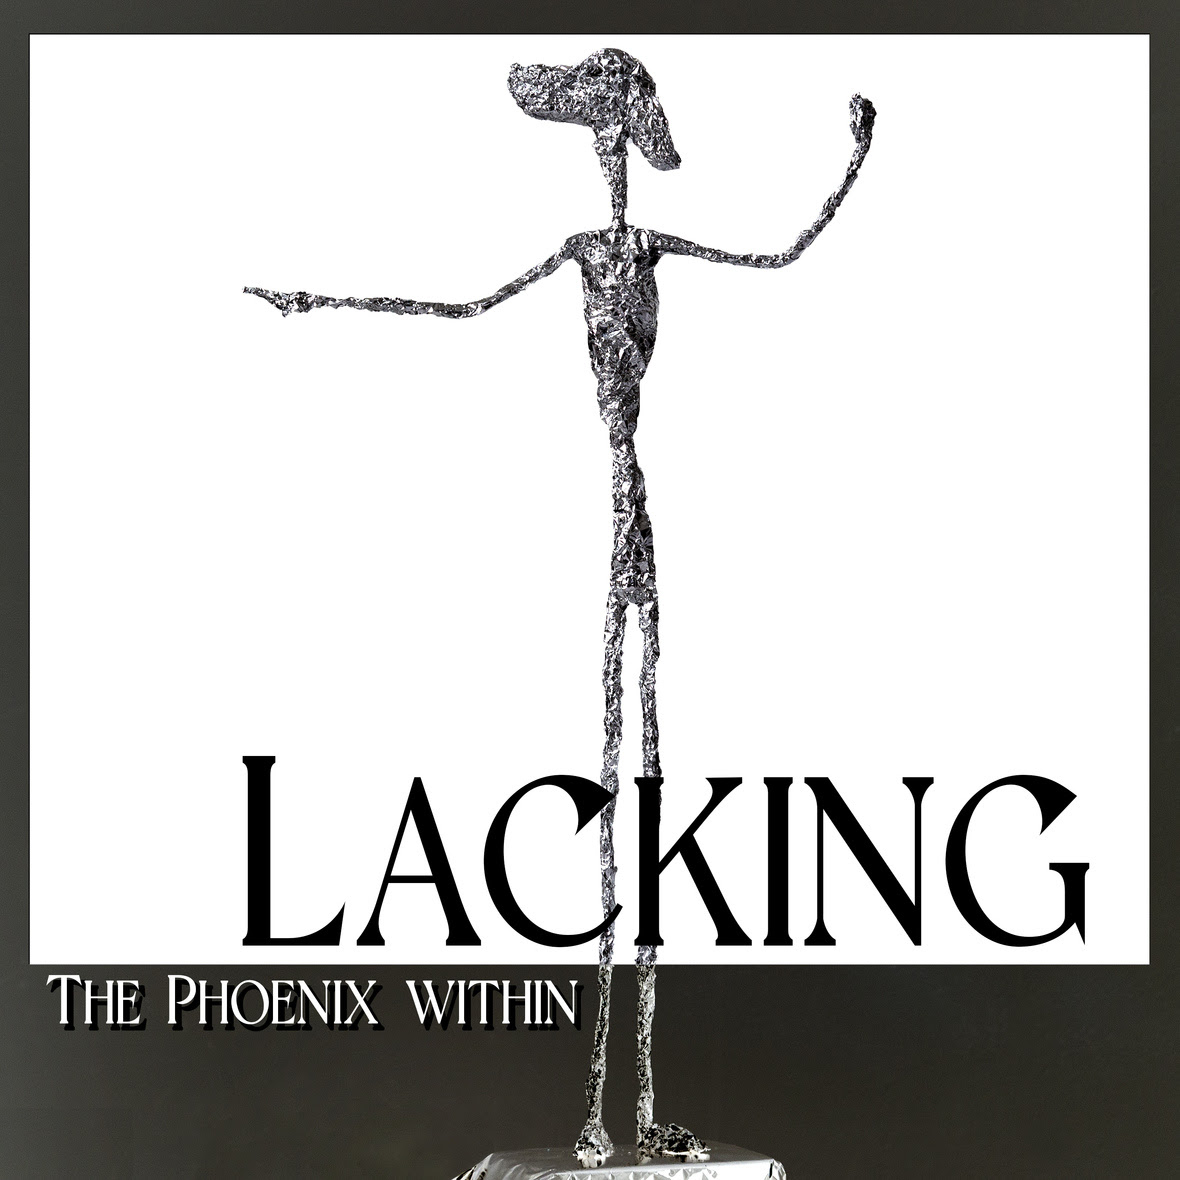 LACKING - ARTWORK